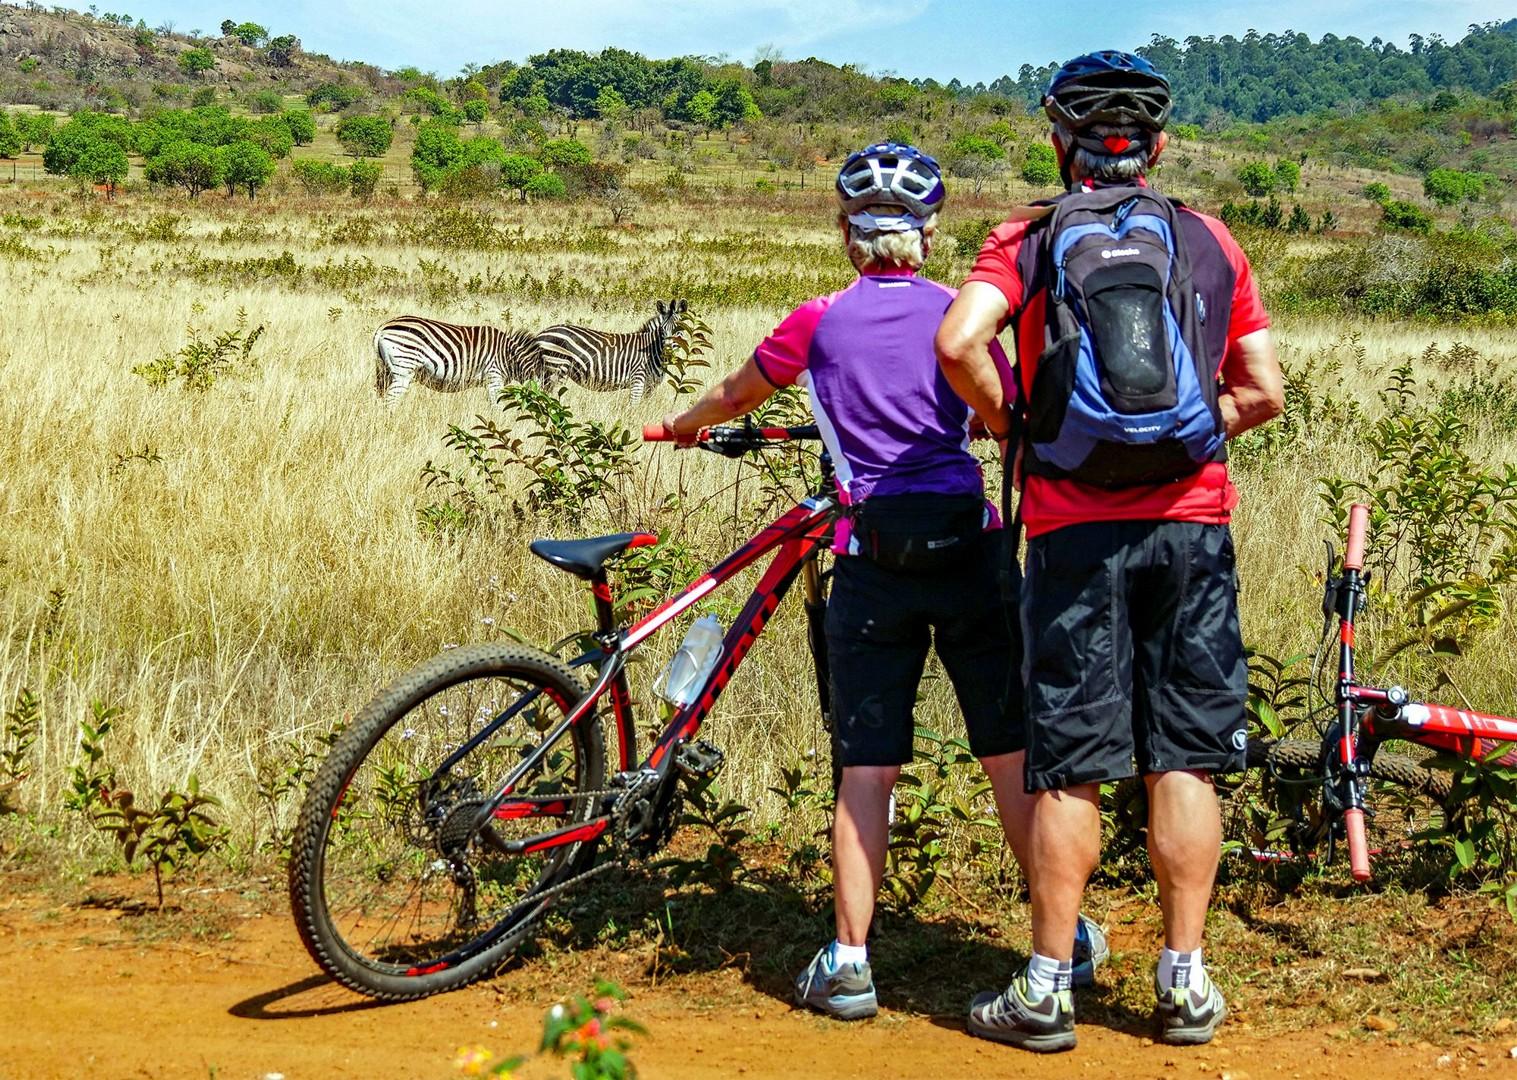 rgfdgfg19.jpg - Eswatini (Swaziland) - Cycling Safari - Cycling Adventures